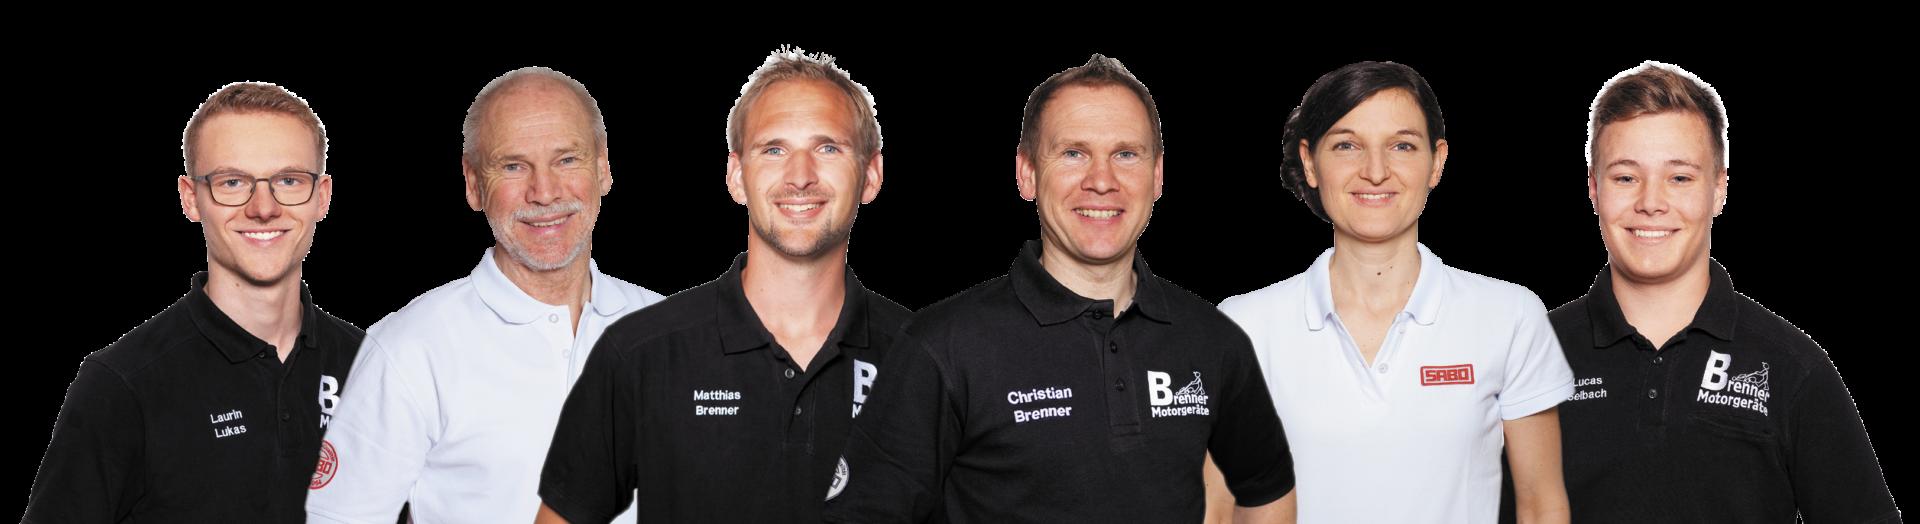 brenner-motogeraete-overath-team